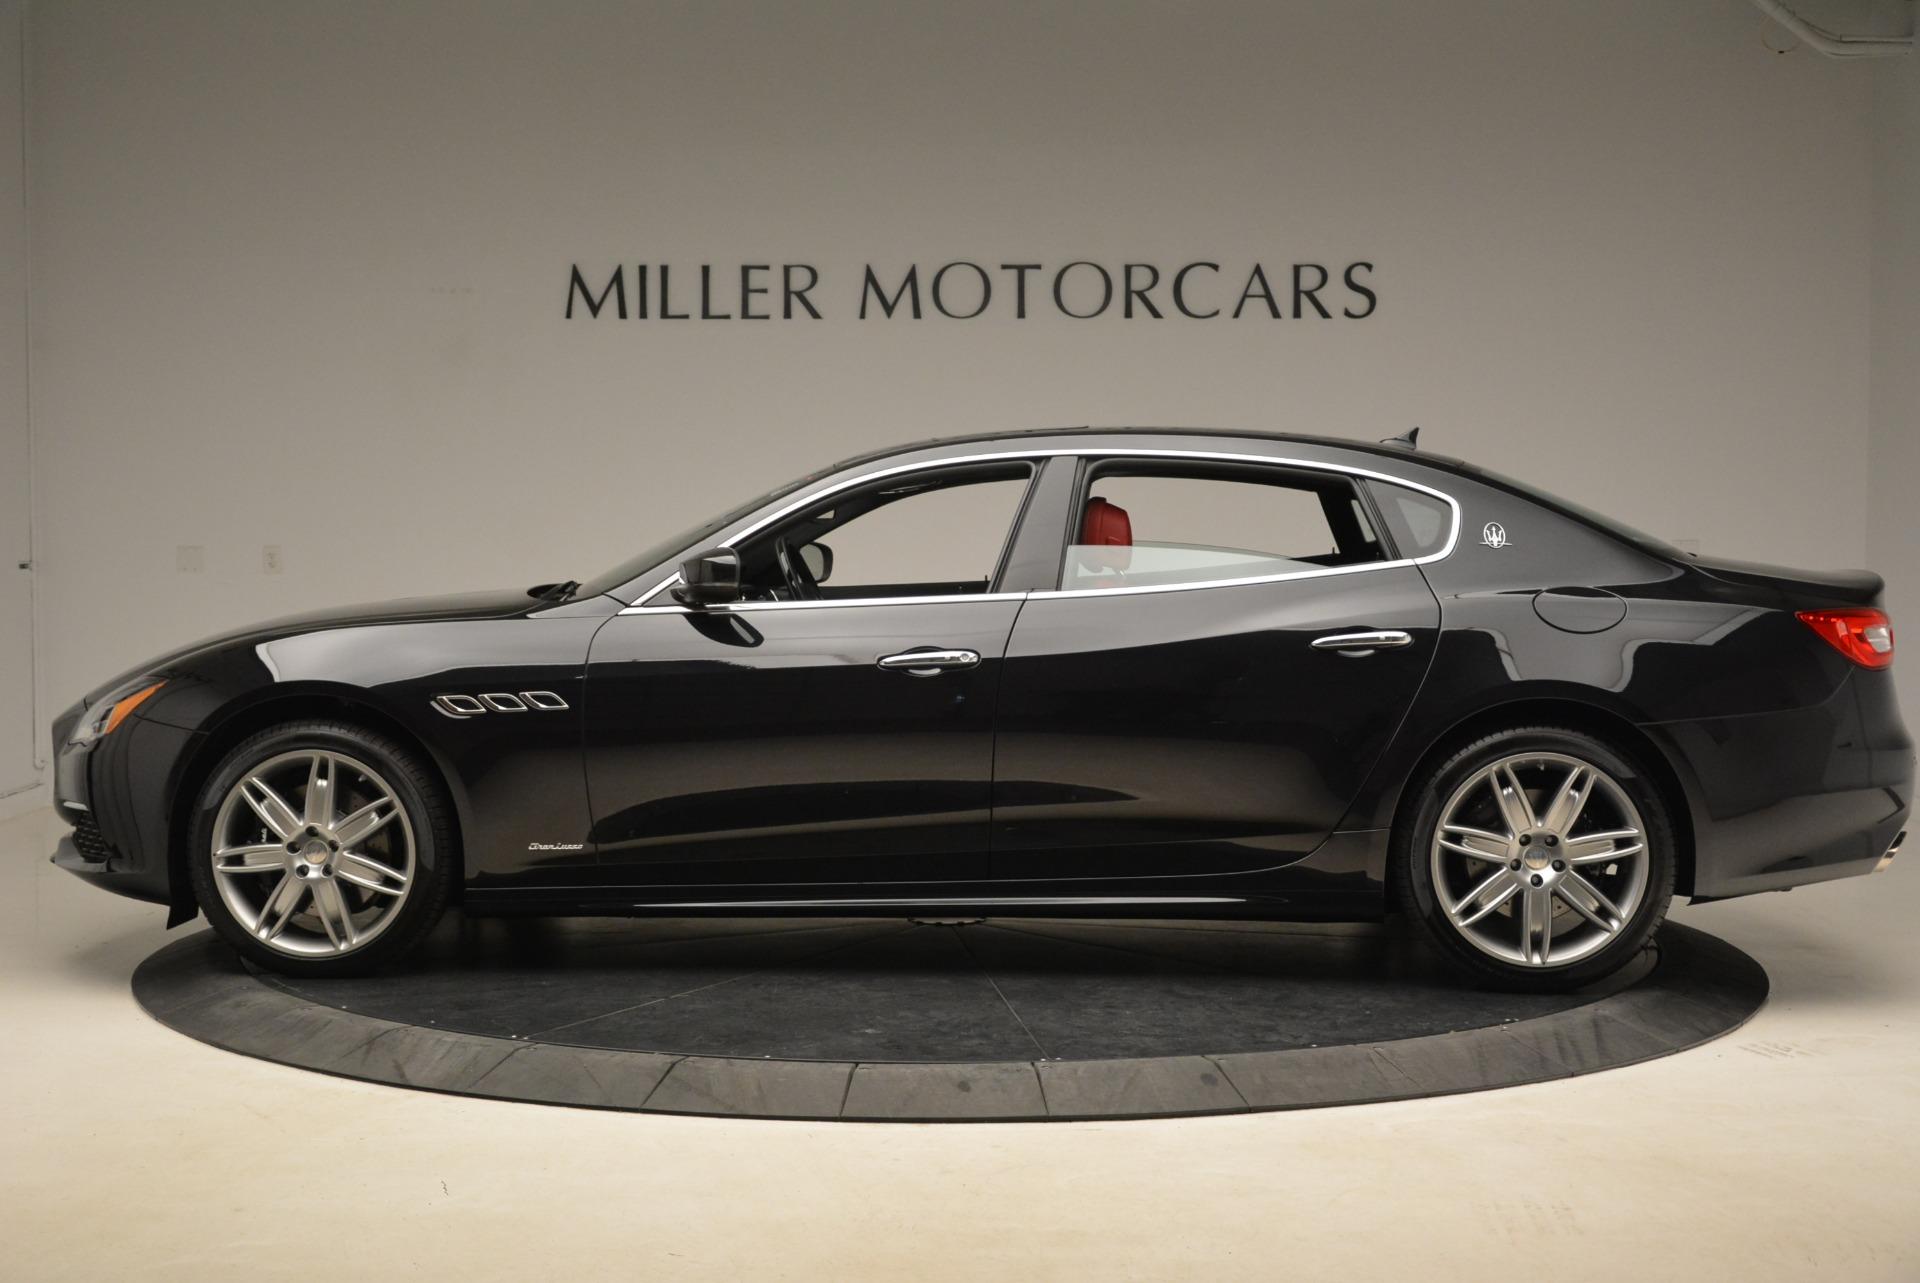 New 2018 Maserati Quattroporte S Q4 GranLusso